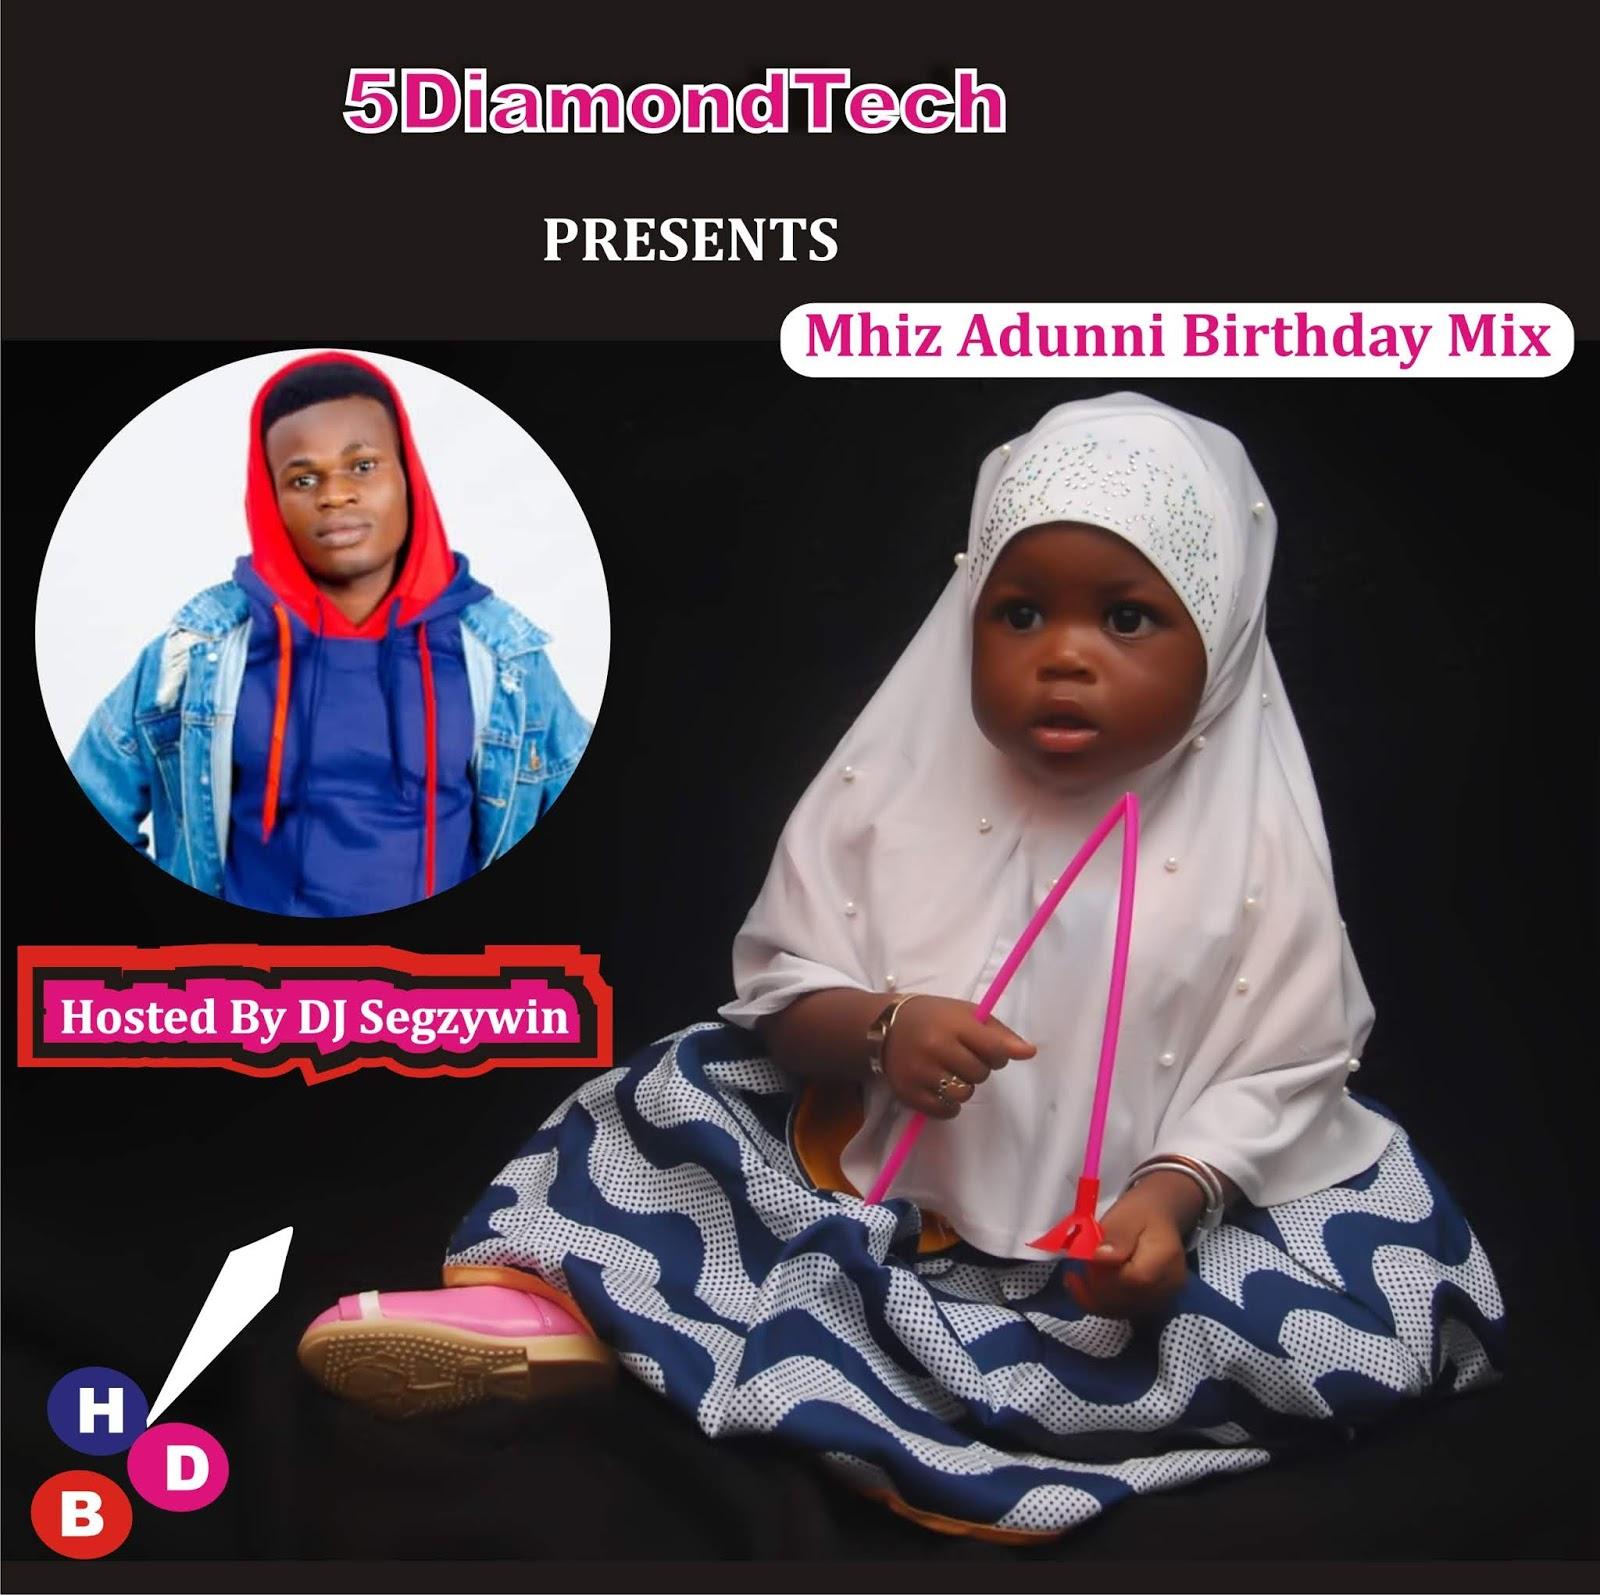 Mixtape] DJ Segzywin – Mhiz Adunni Birthday Mix